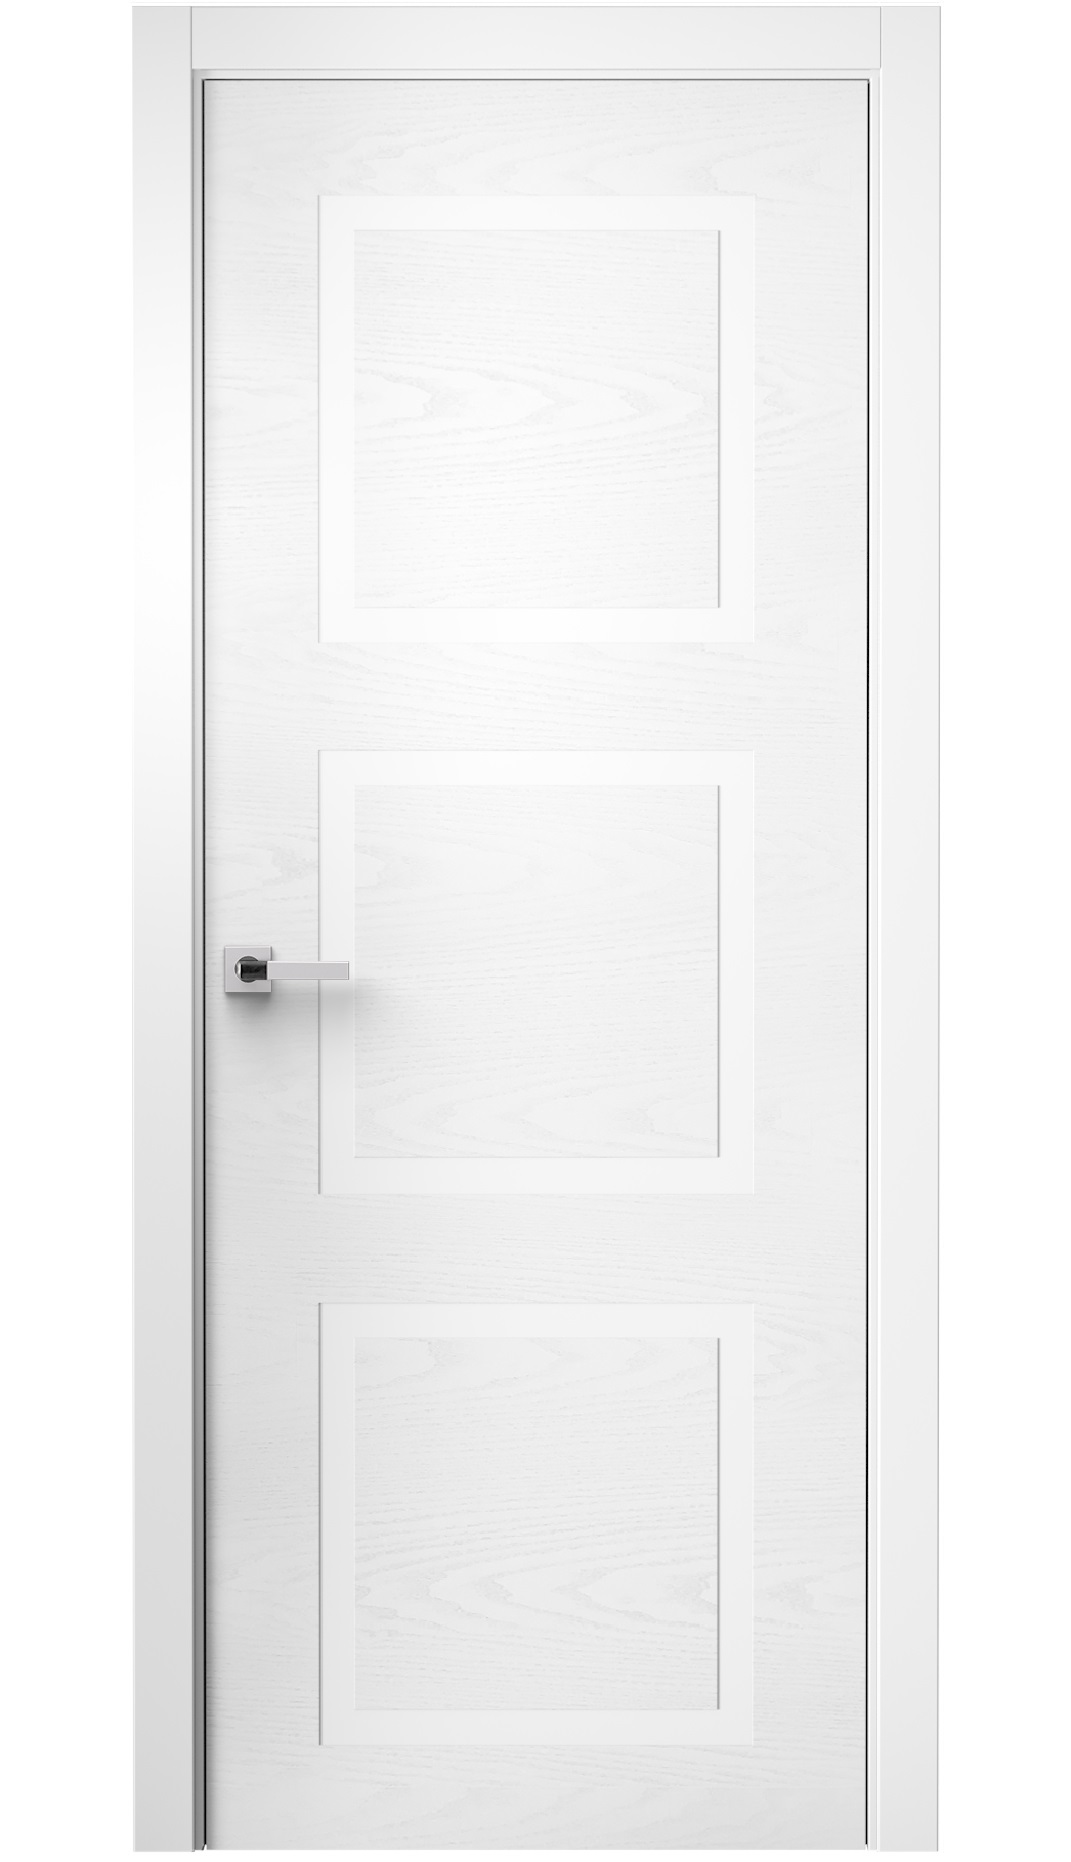 Image Comforto Interior Door White Ash / White 0